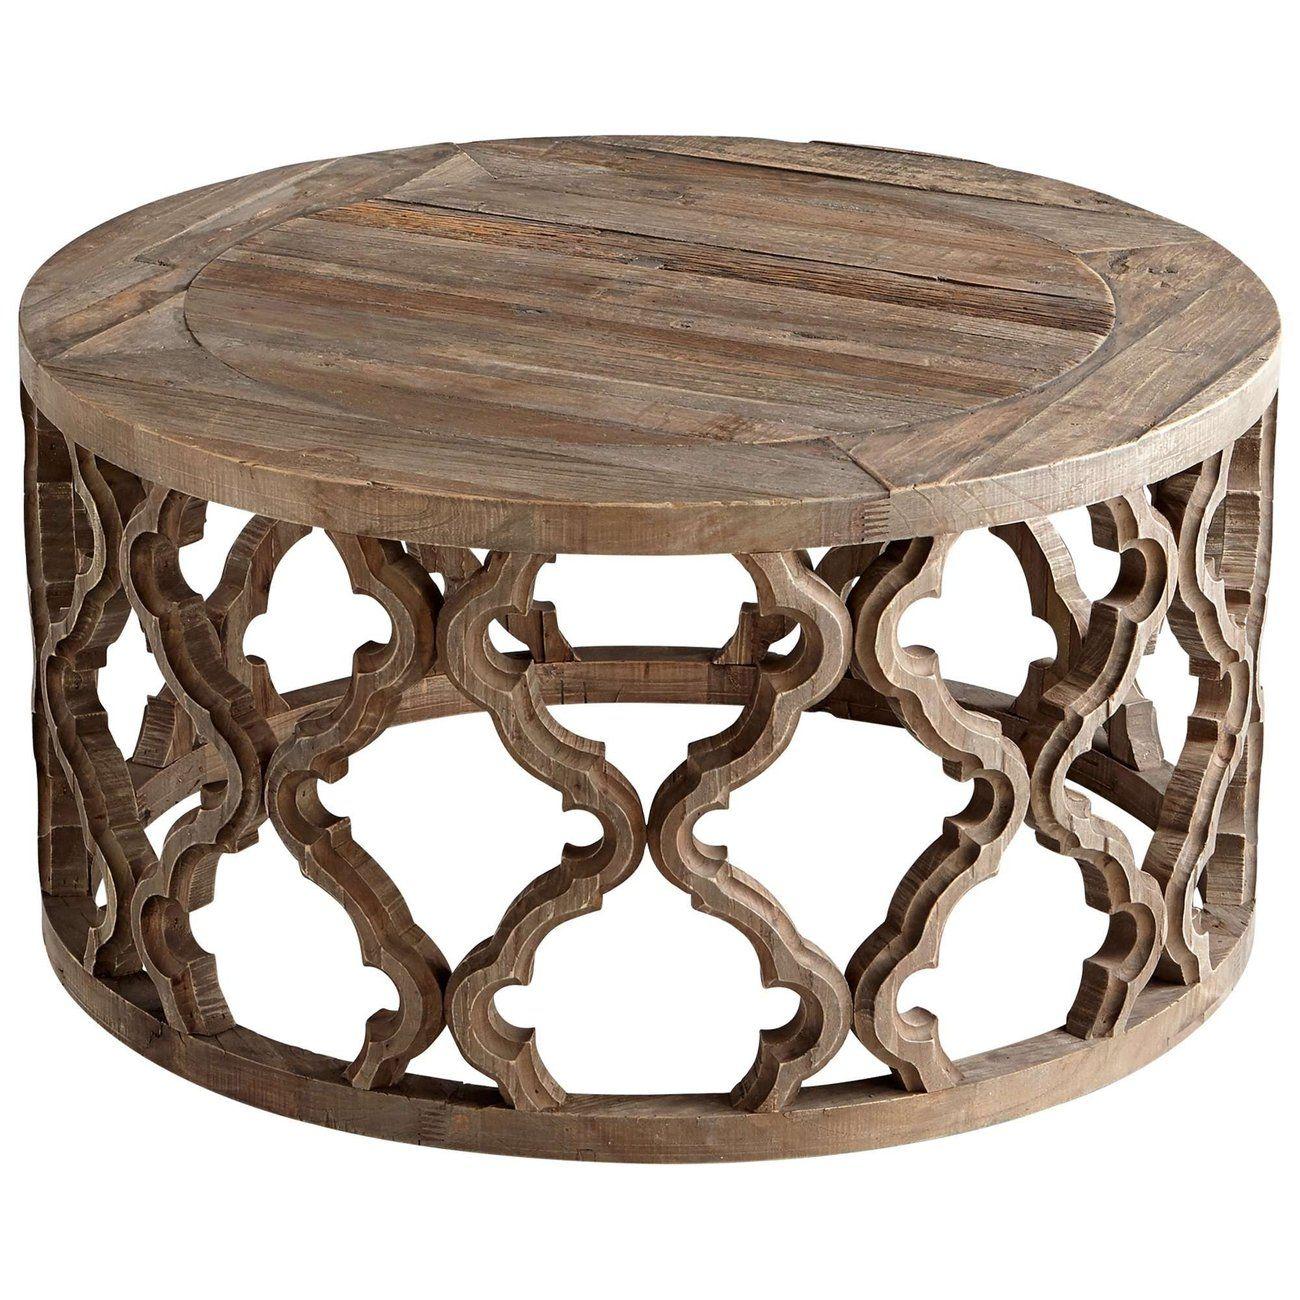 Sirah Coffee Table Coffee Table Wood Coffee Table Round Coffee Table [ 1300 x 1300 Pixel ]